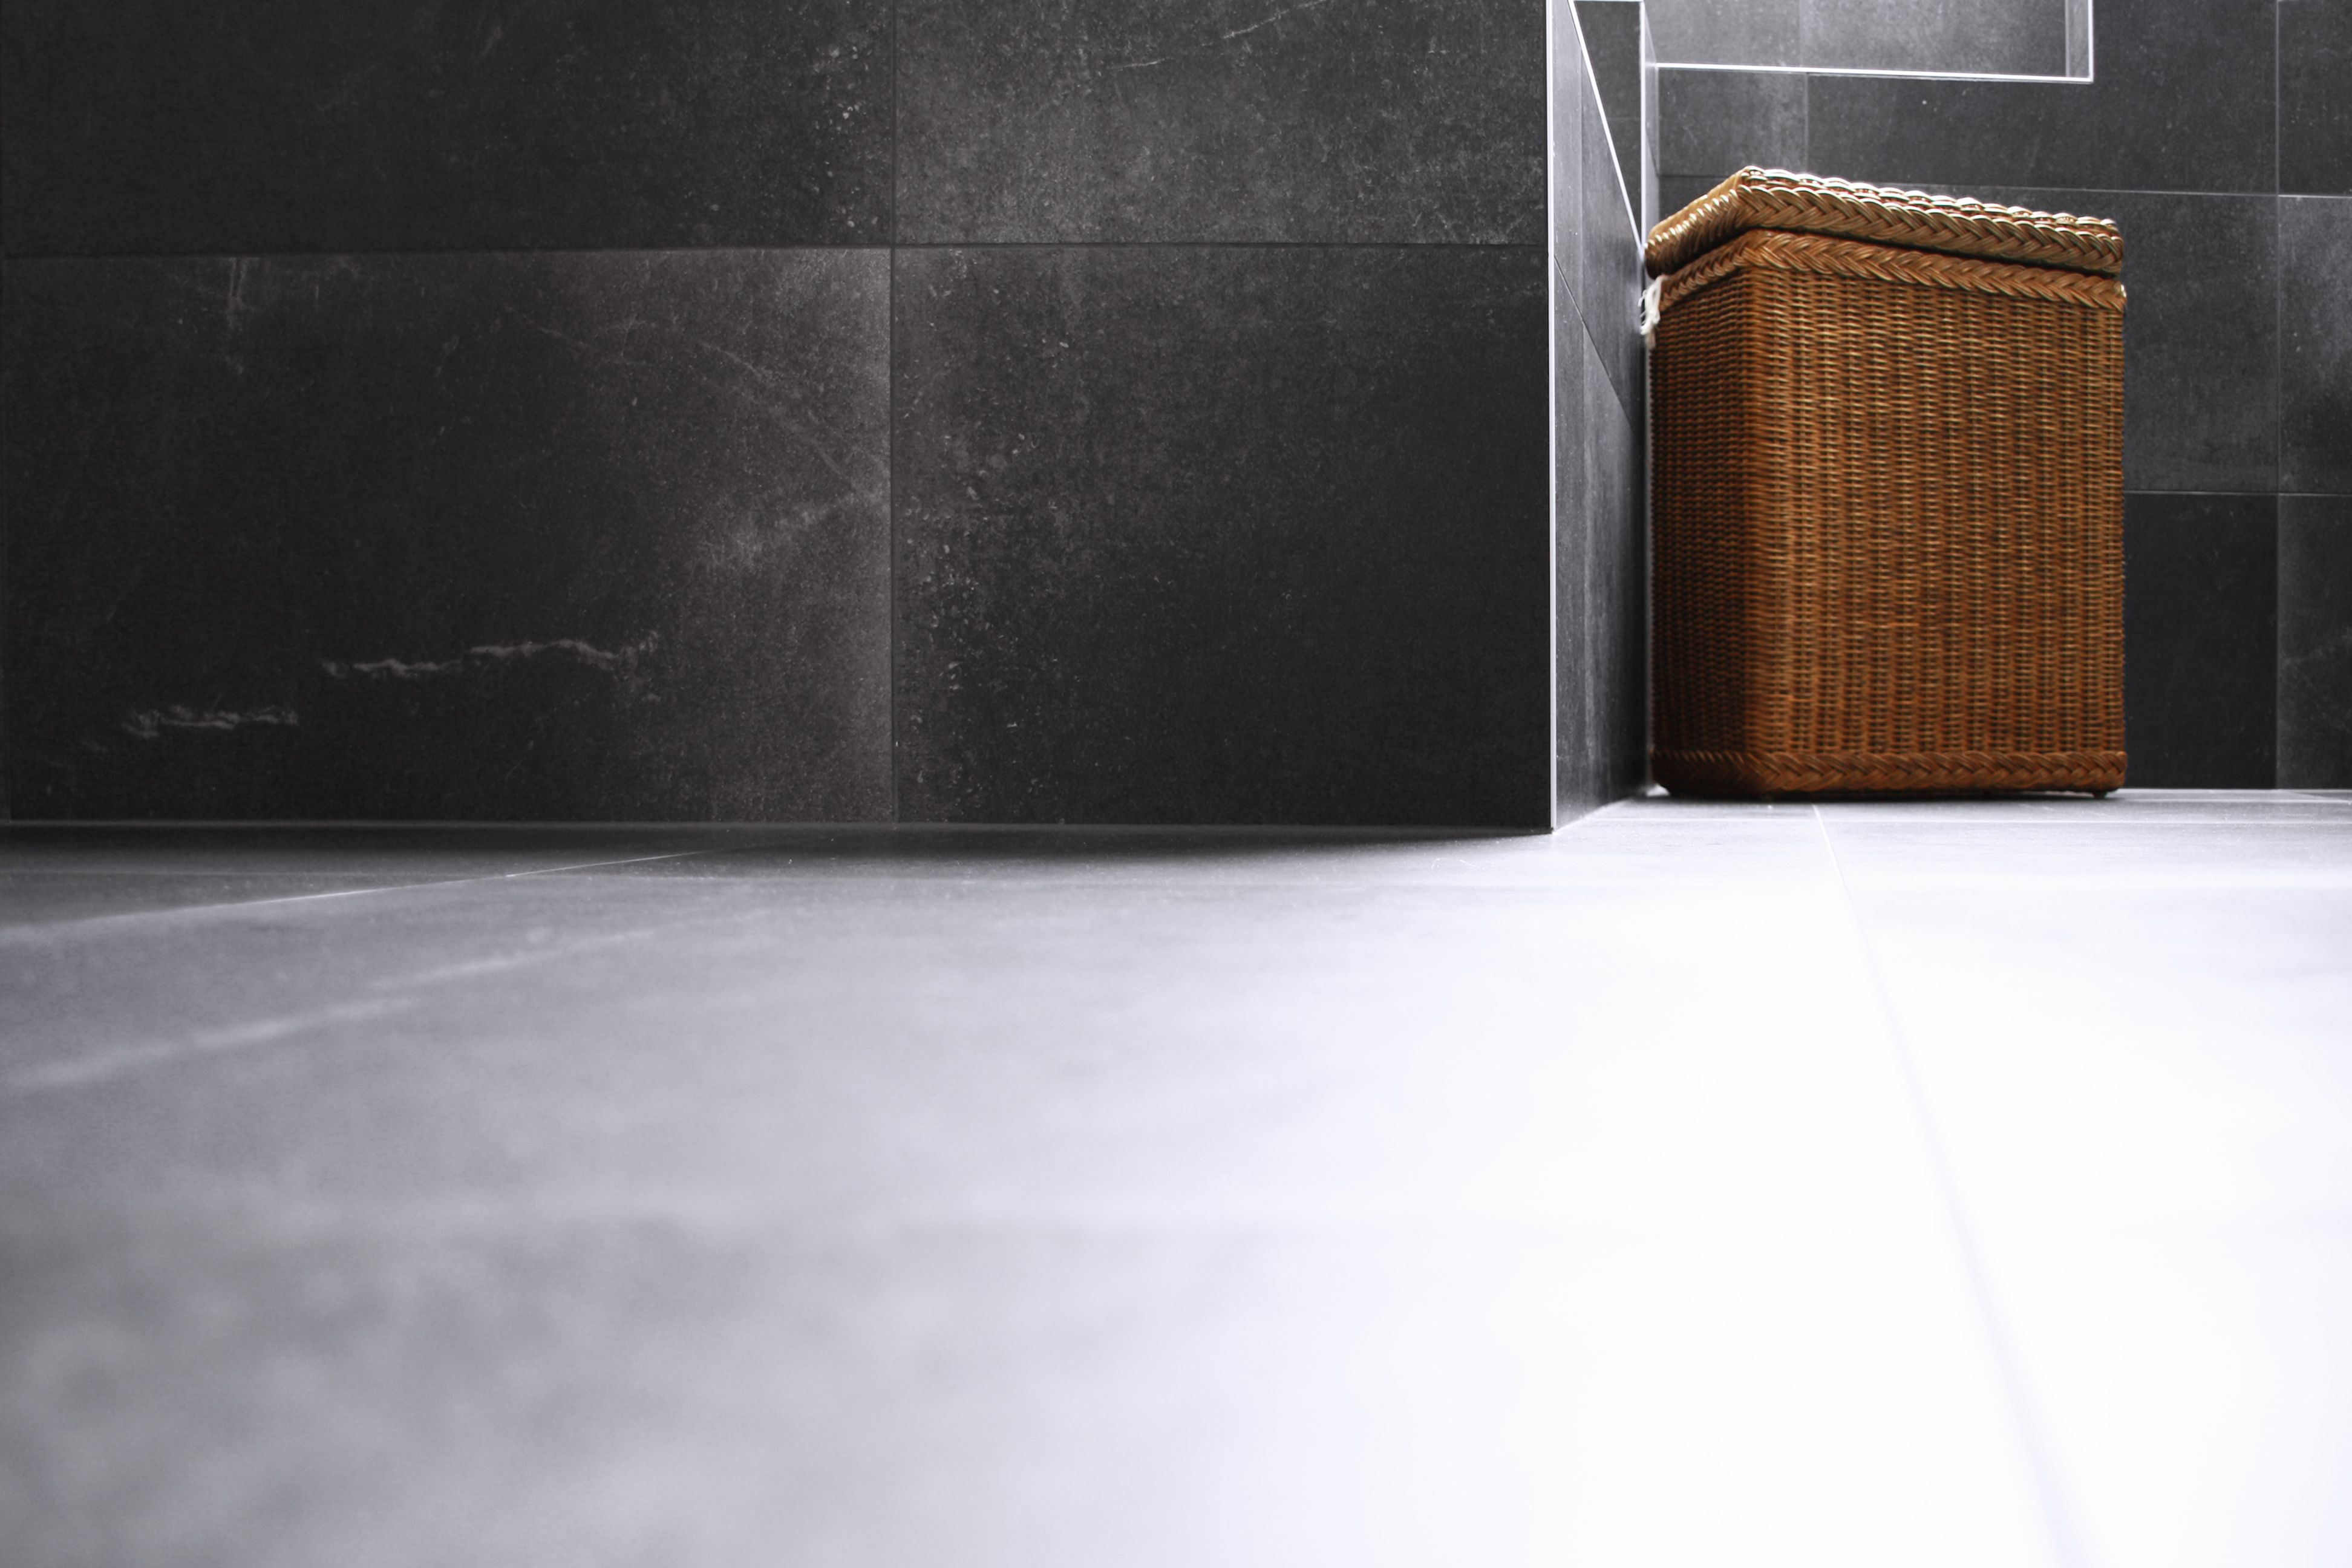 badkamer tegels mand - Tegelwerken Trogh